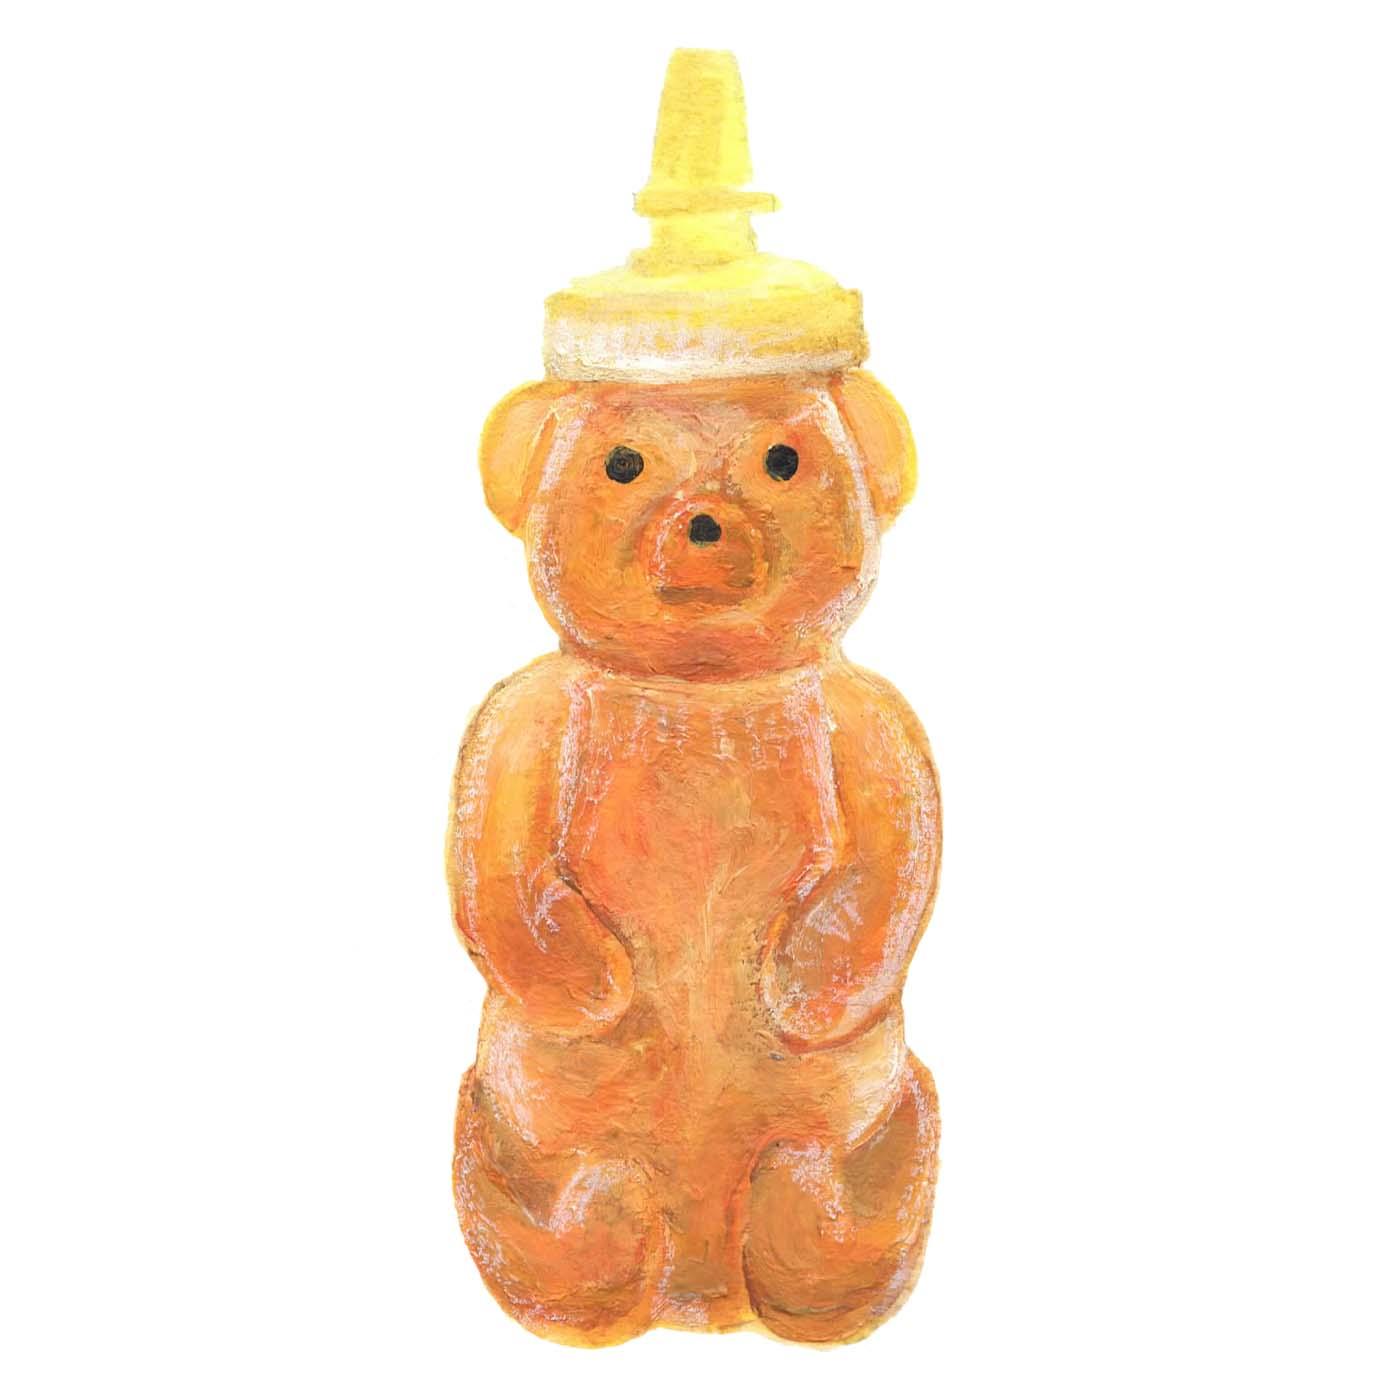 Condimental_Honey_Bear_Edit.jpg